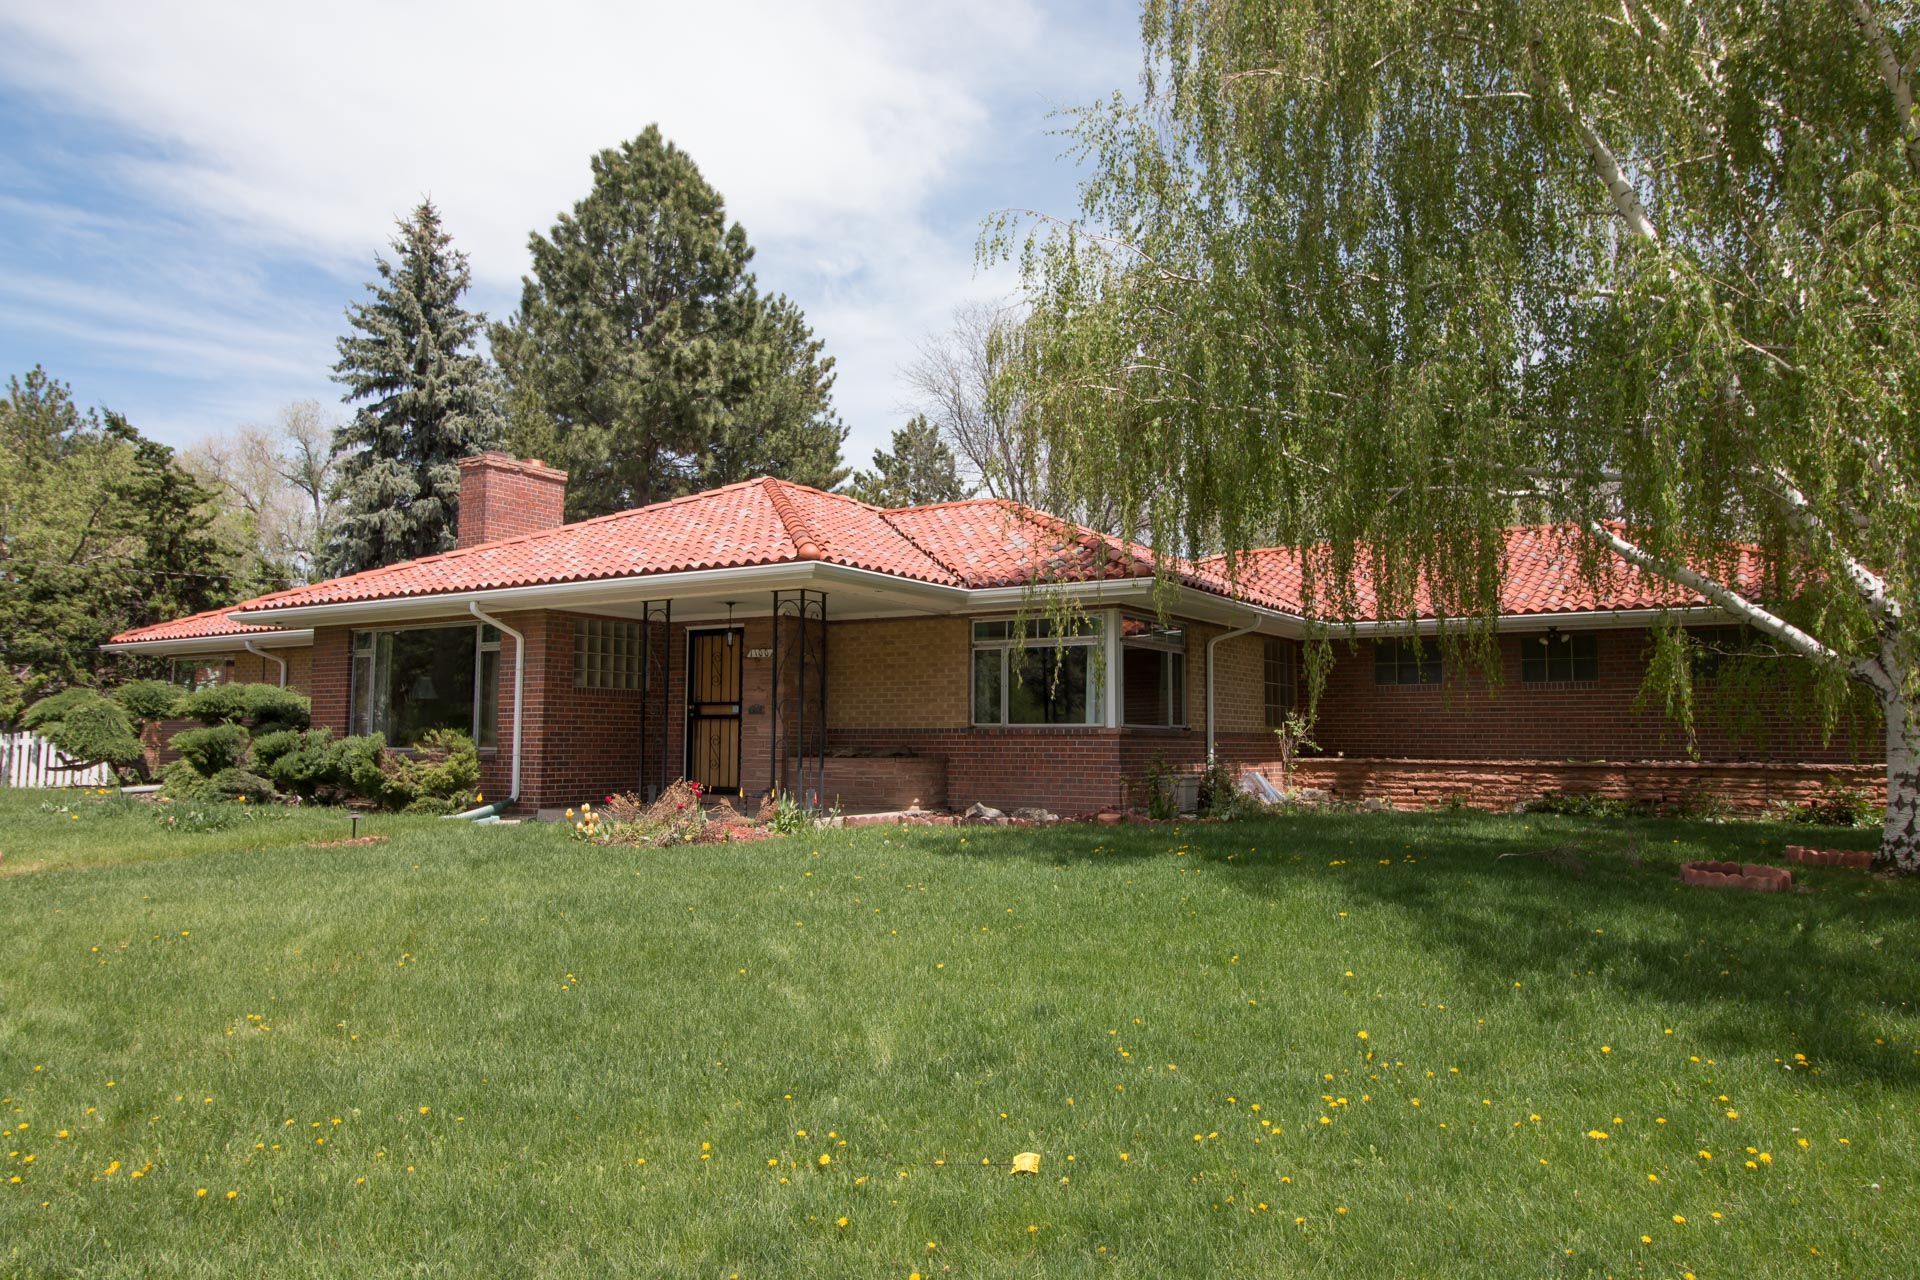 A style of Frank Lloyd Wright-ian modern home.